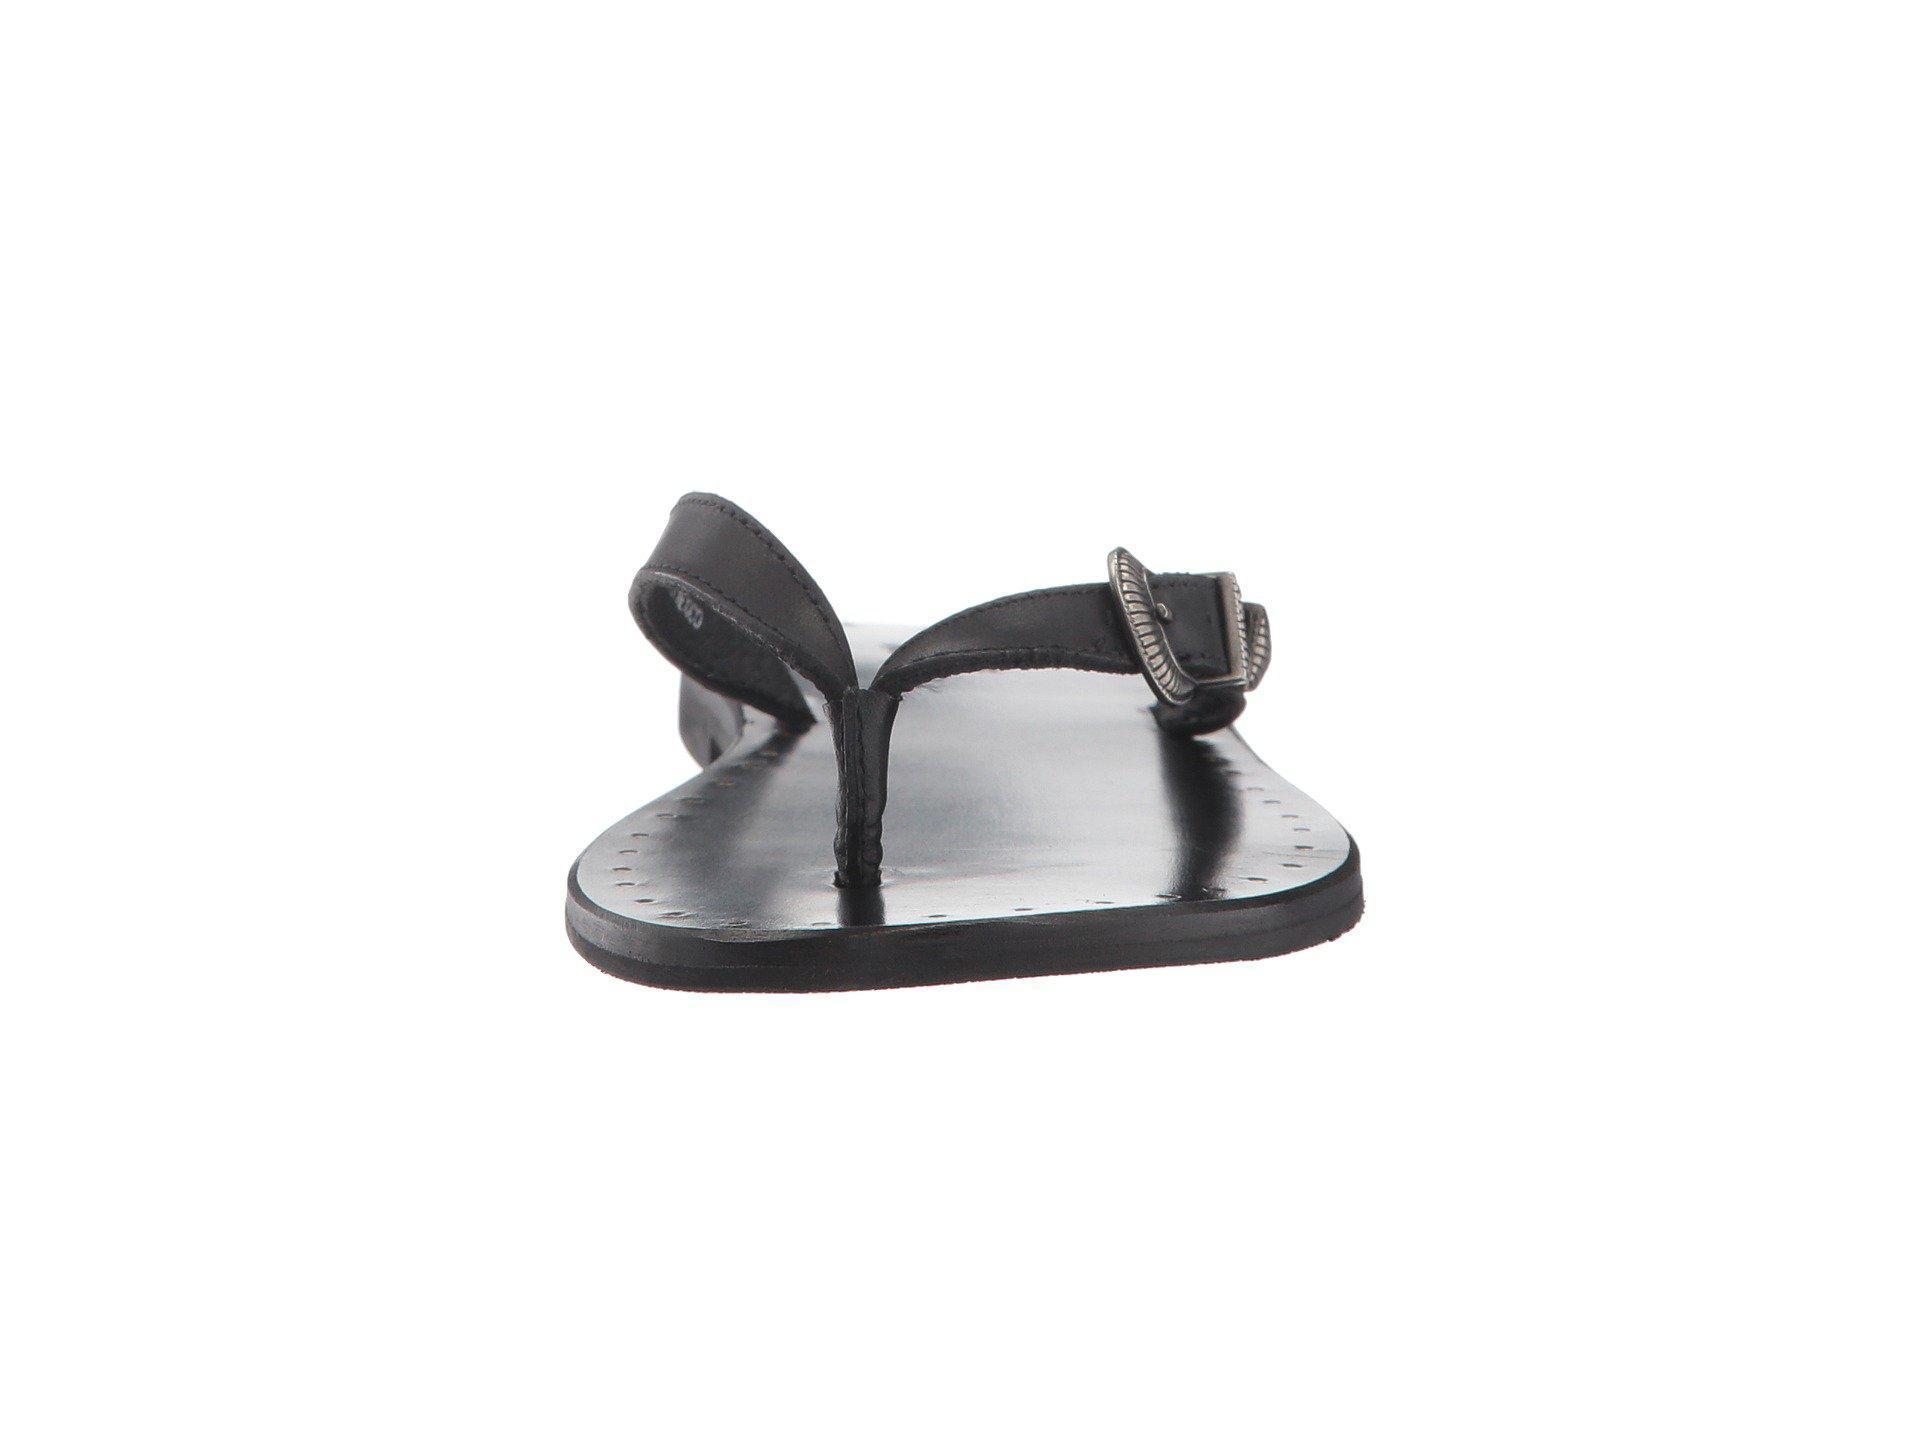 e6e80355a87245 Lyst - Frye Ally Western Flip Flop in Black - Save 29.59183673469387%